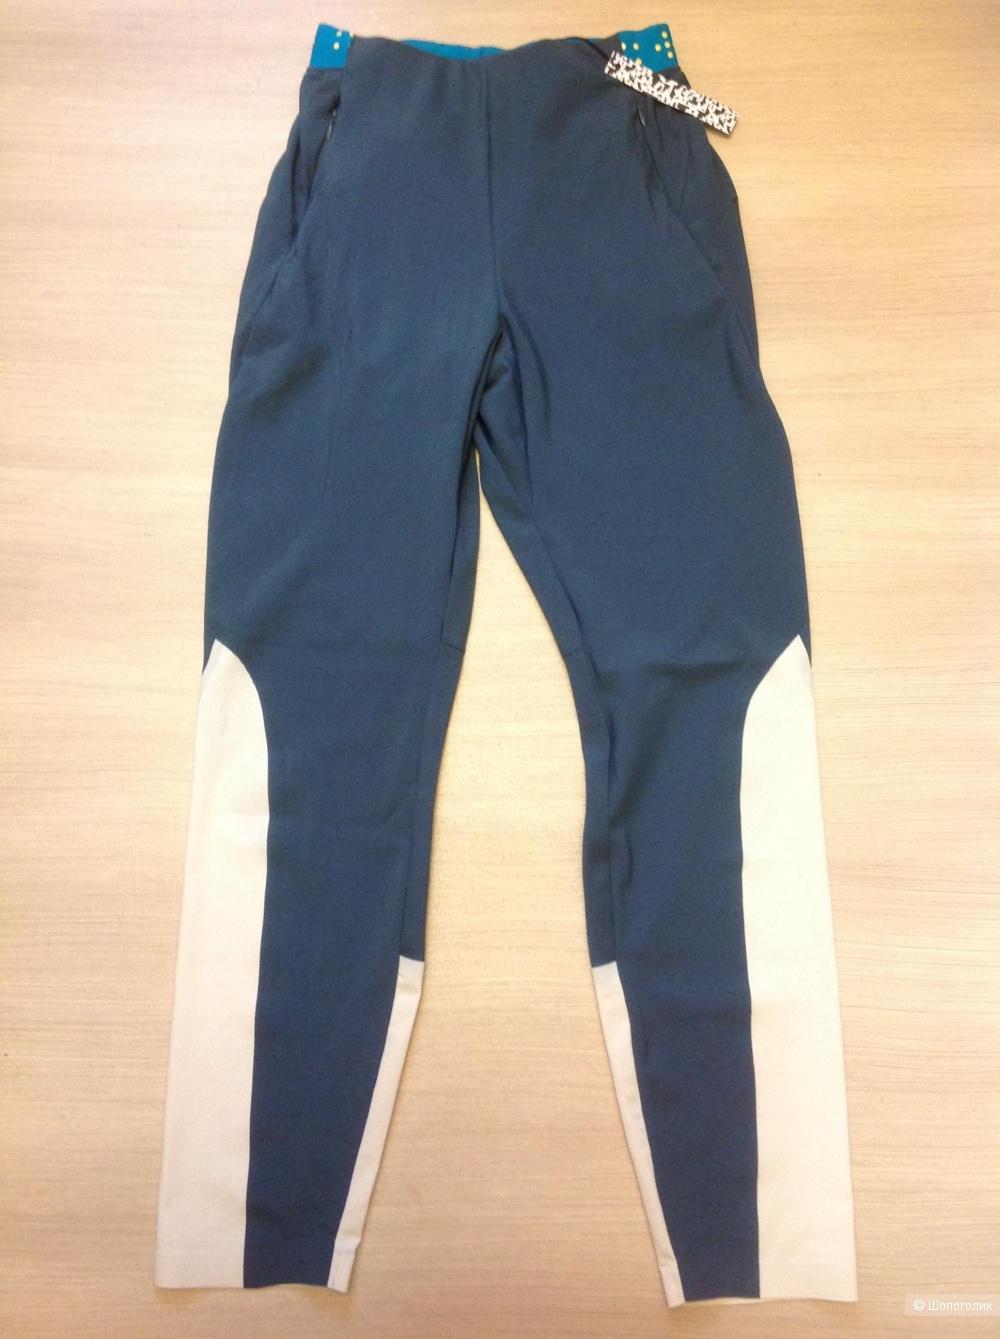 Спортивные штаны ASOS 4505, разм. XS